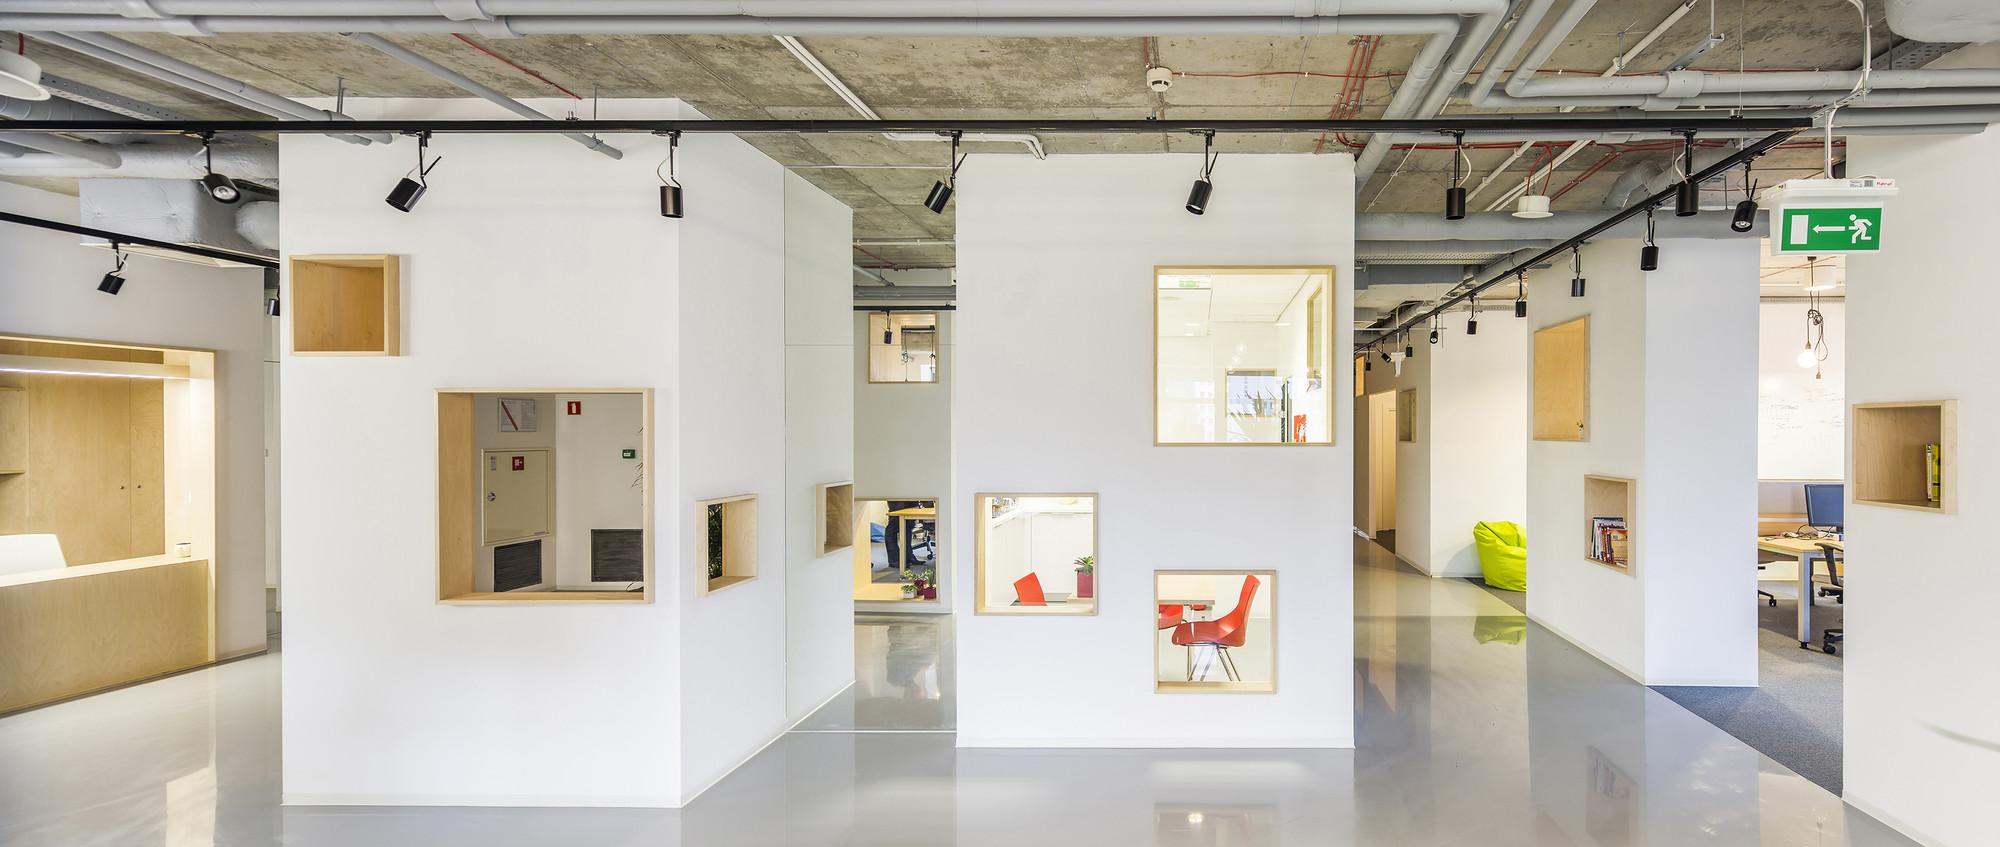 DECERTO / MOKO Architects + MFRMGR, © Jakub Certowicz